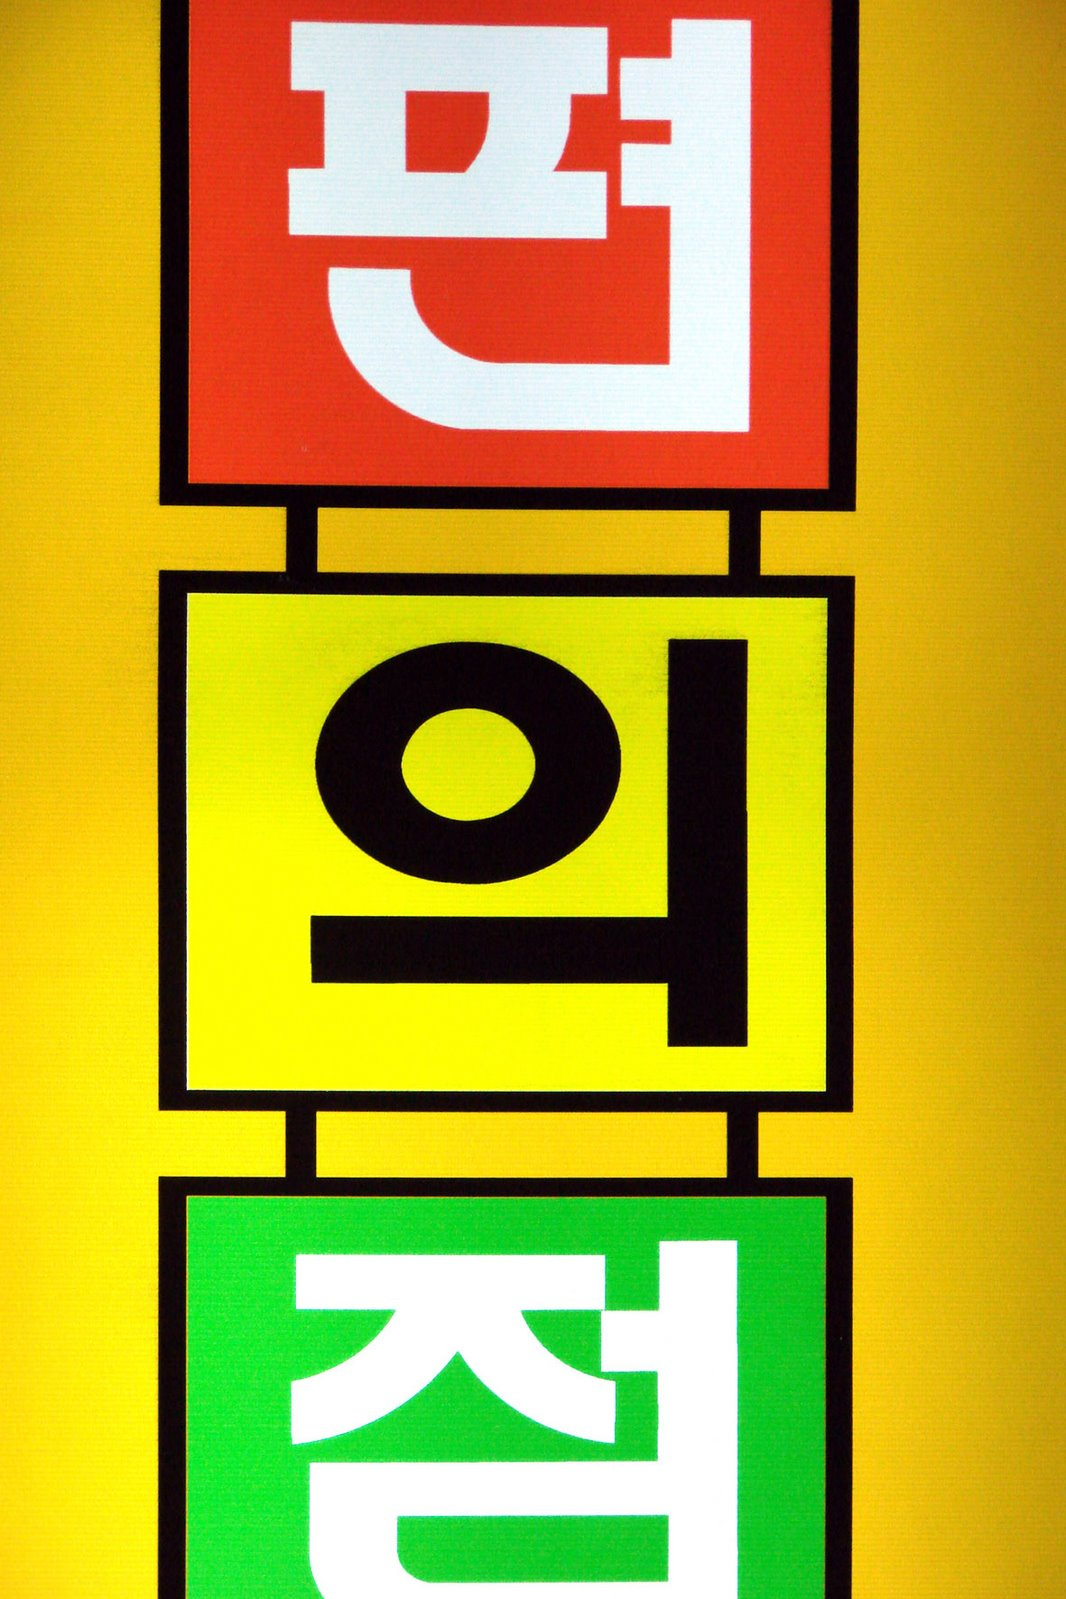 [1-+Hangeul+3599+hangeul.jpg]